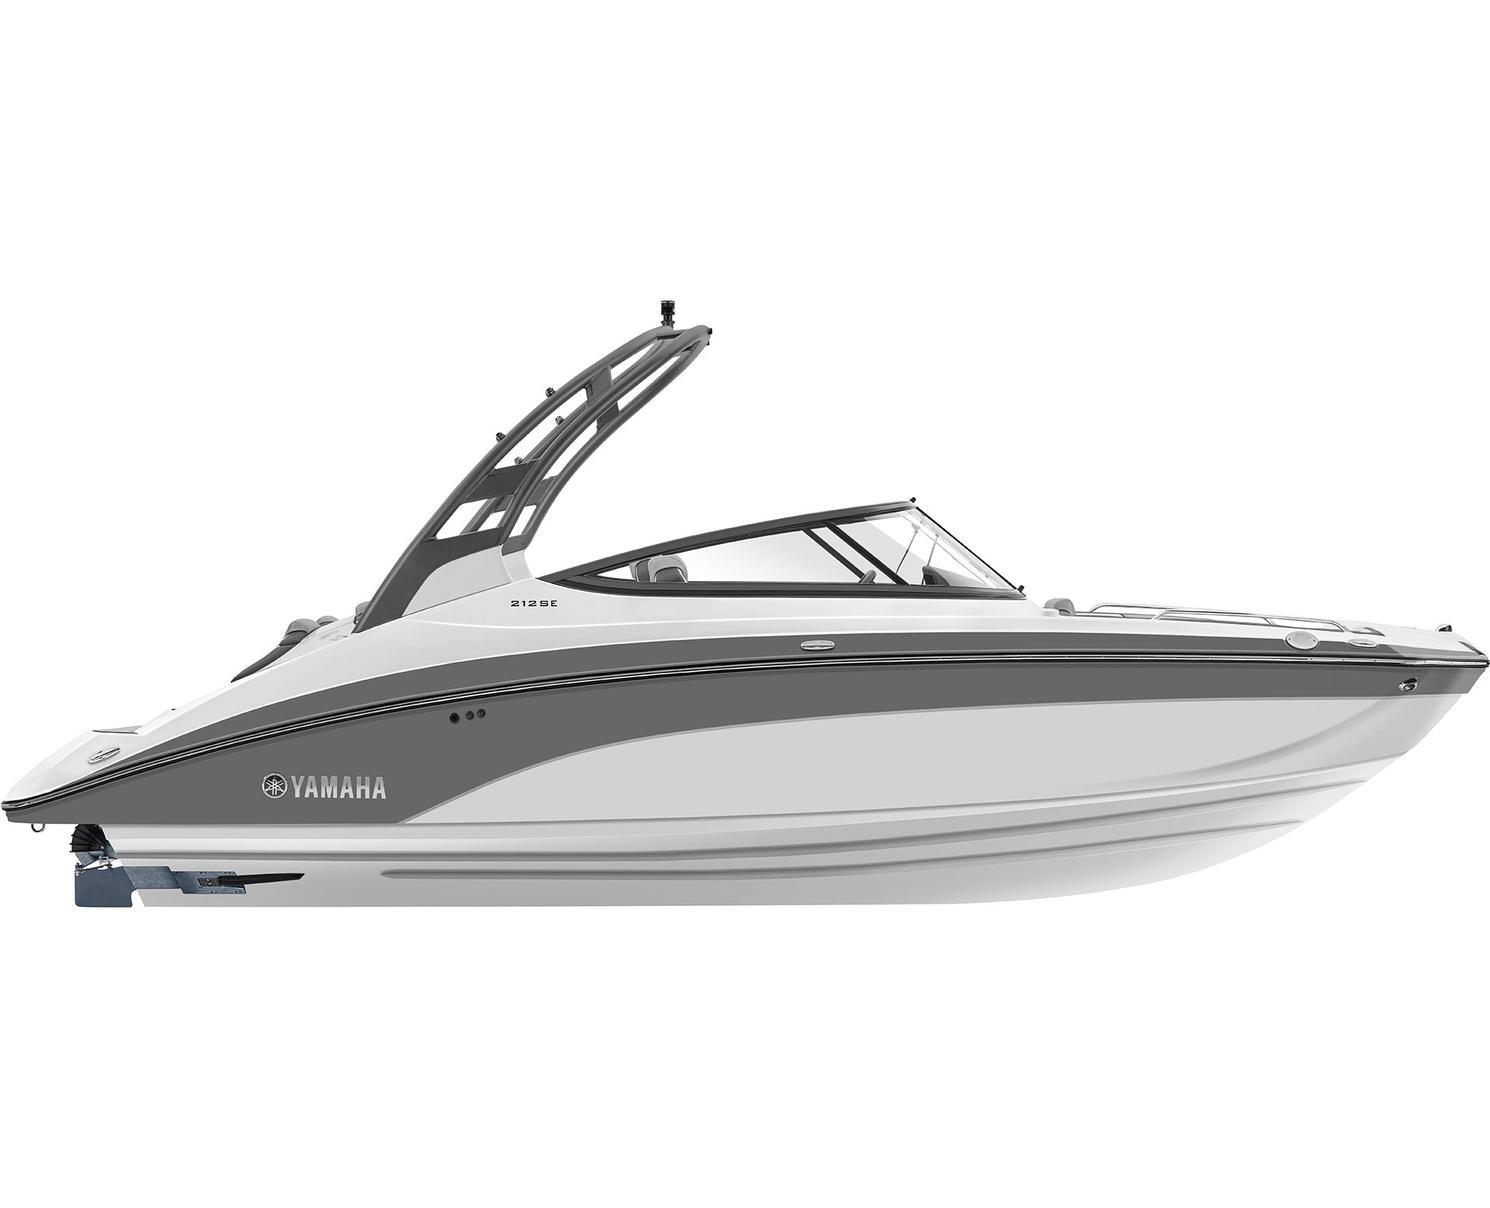 Yamaha 212SE White With Suede Grey